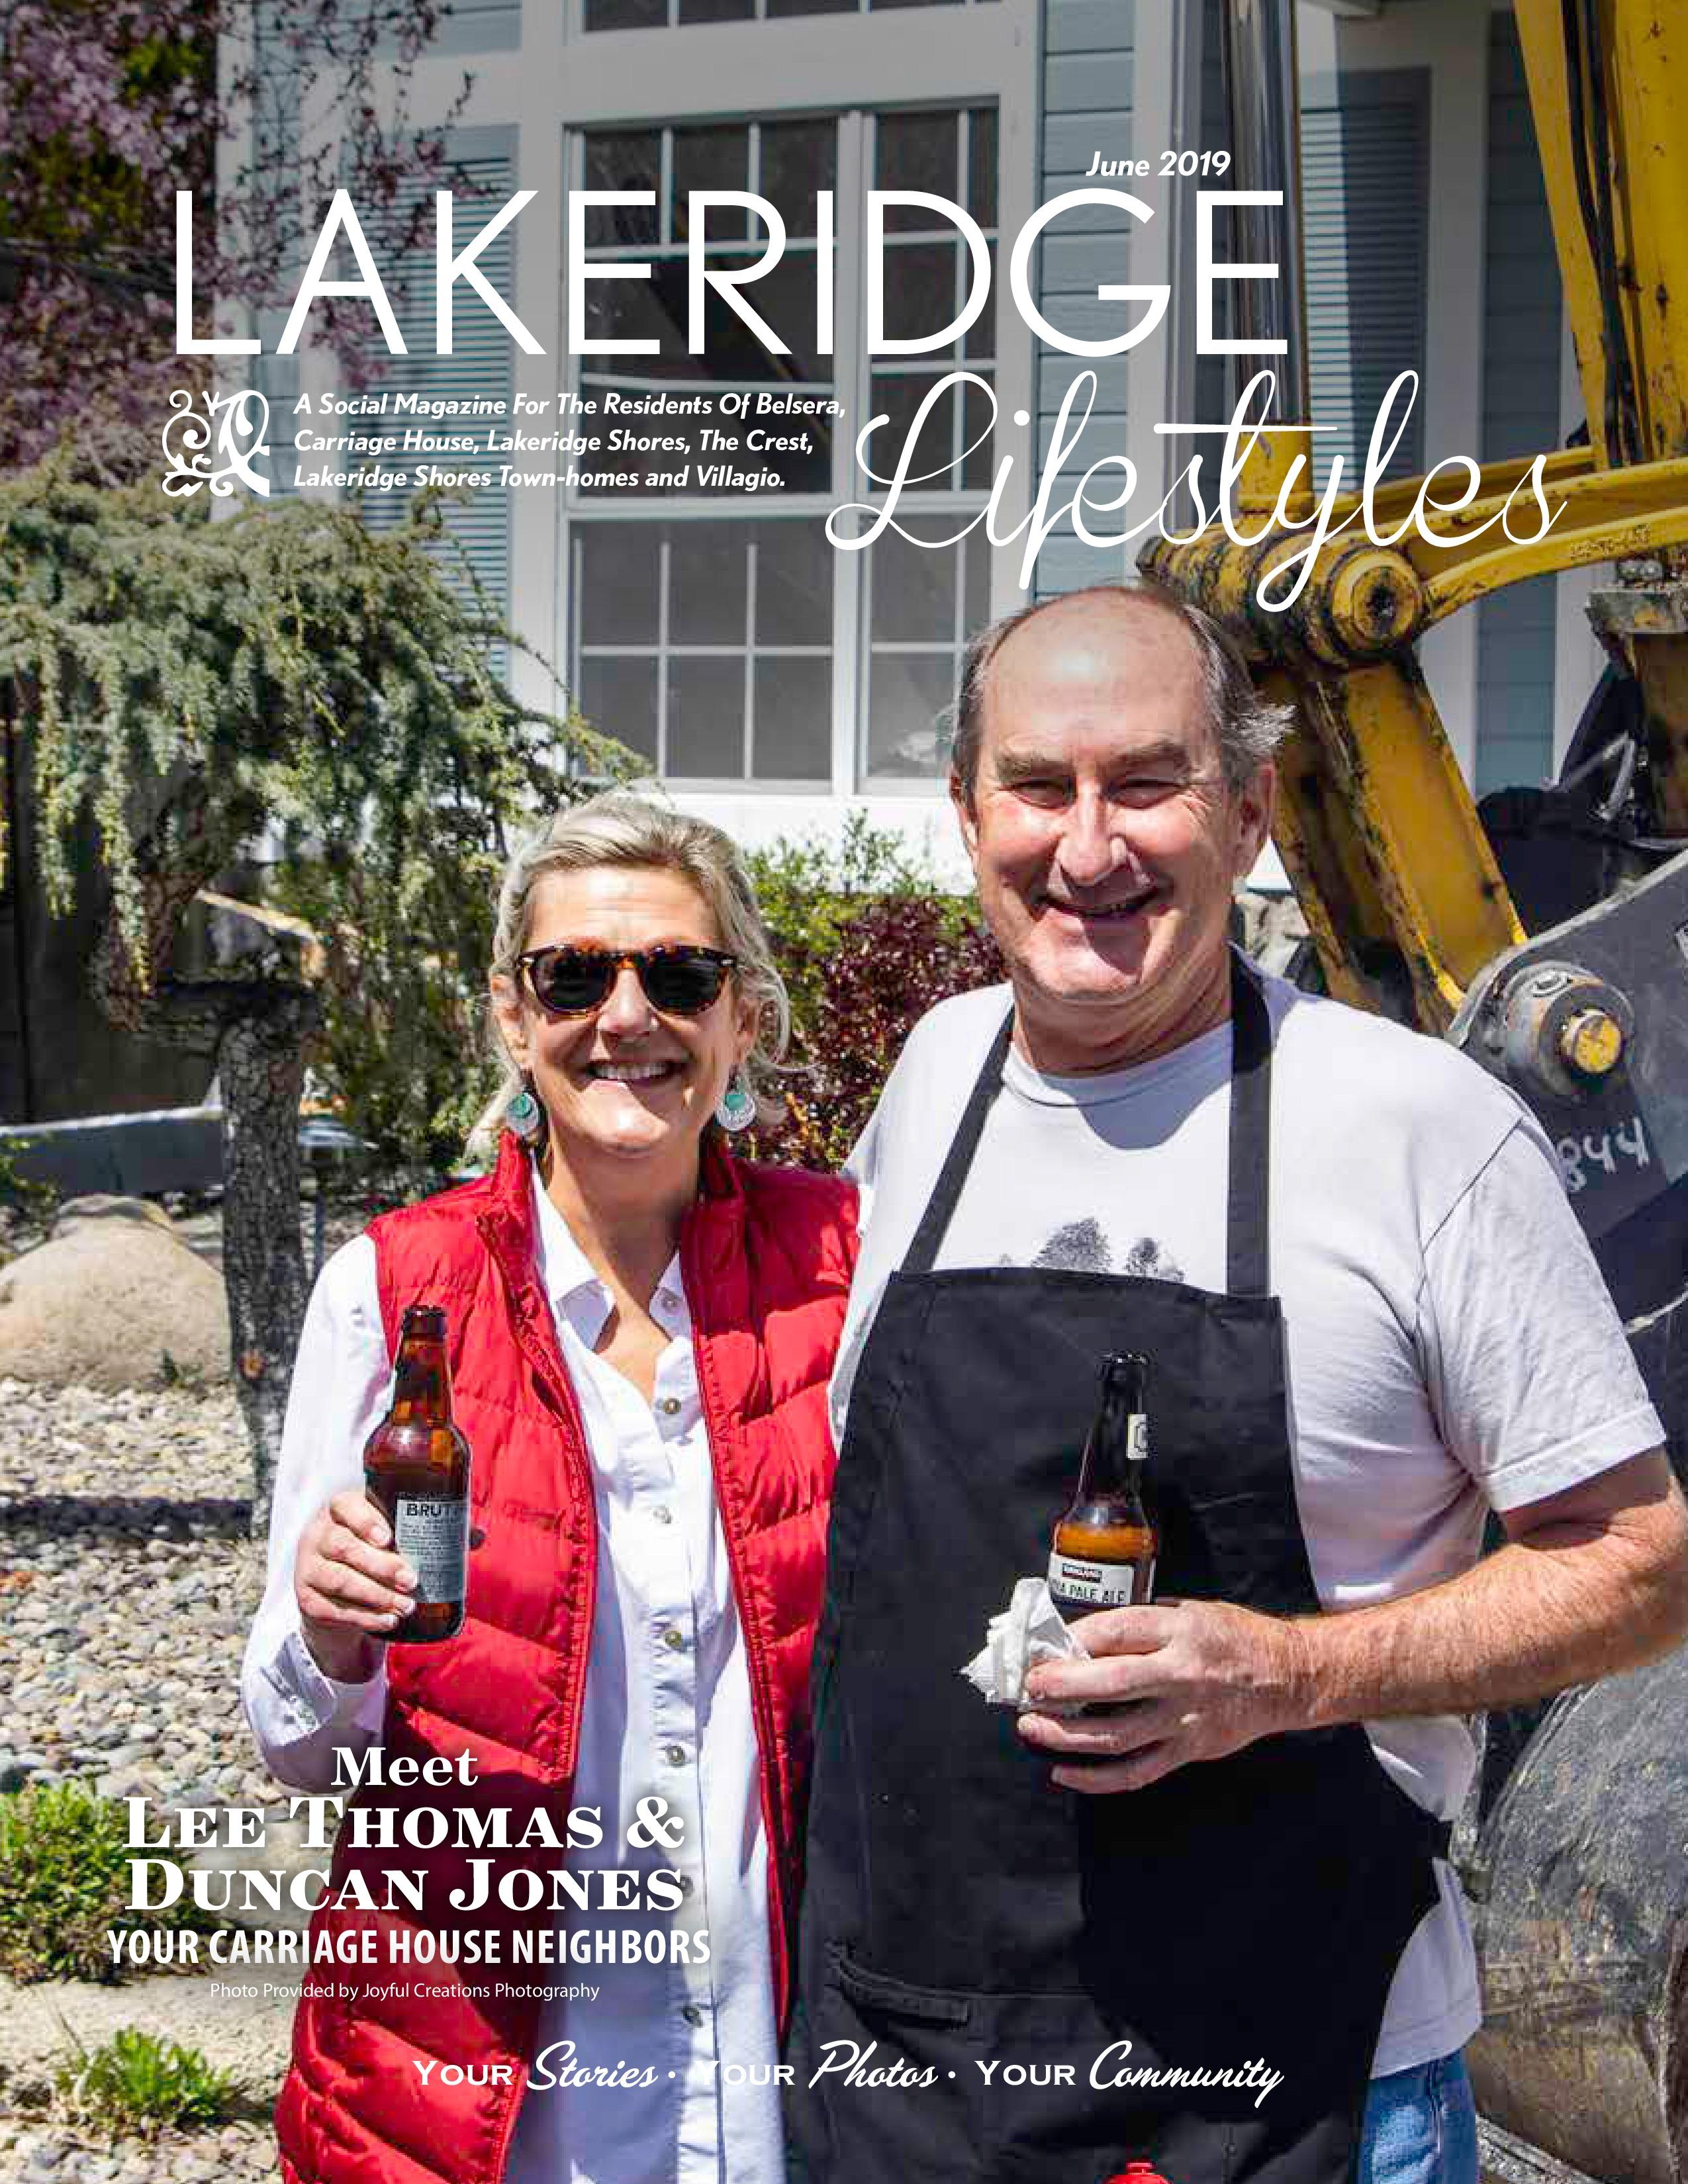 Jun 2019 lakeridge lifestyles page 1